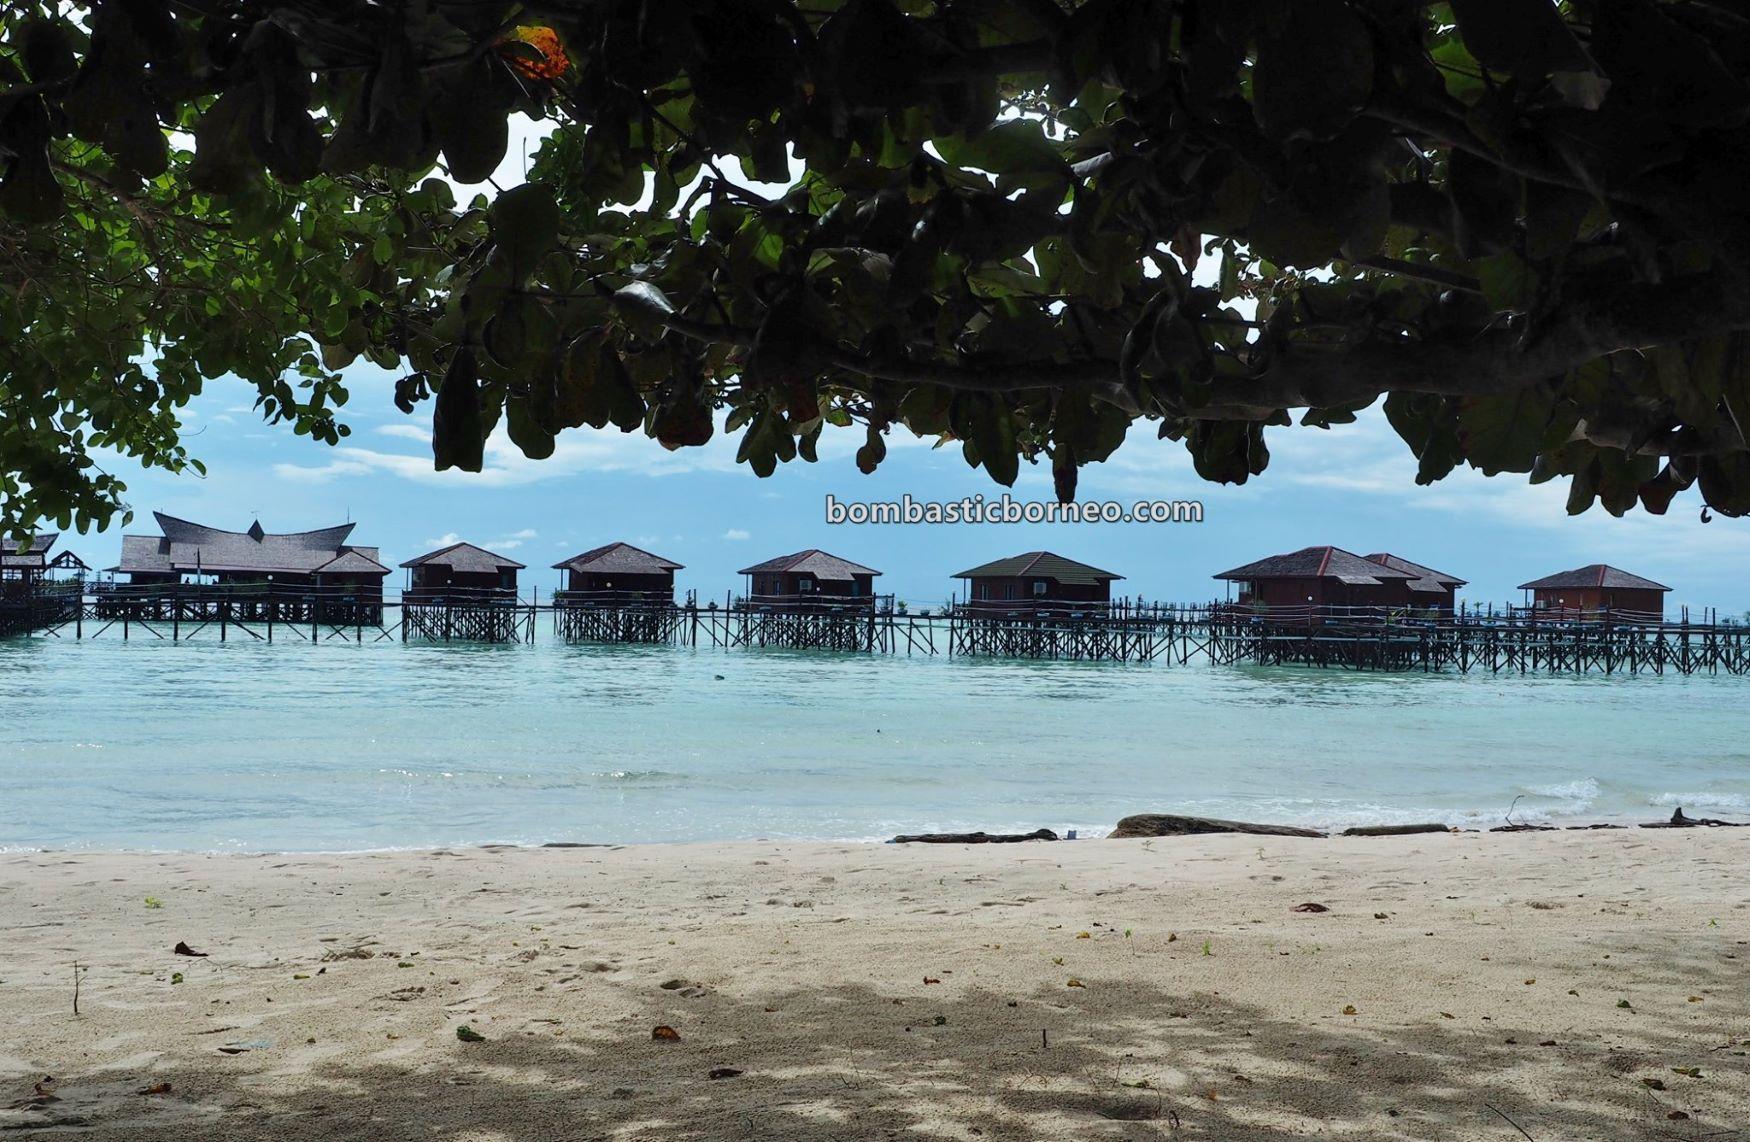 Kepulauan Derawan, white sandy beaches, backpackers, Destination, snorkelling, nature, hidden paradise, Berau, Indonesia, wisata alam, travel guide, Trans Borneo, 穿越婆罗洲游踪, 印尼东加里曼丹, 马拉图娃岛旅游景点